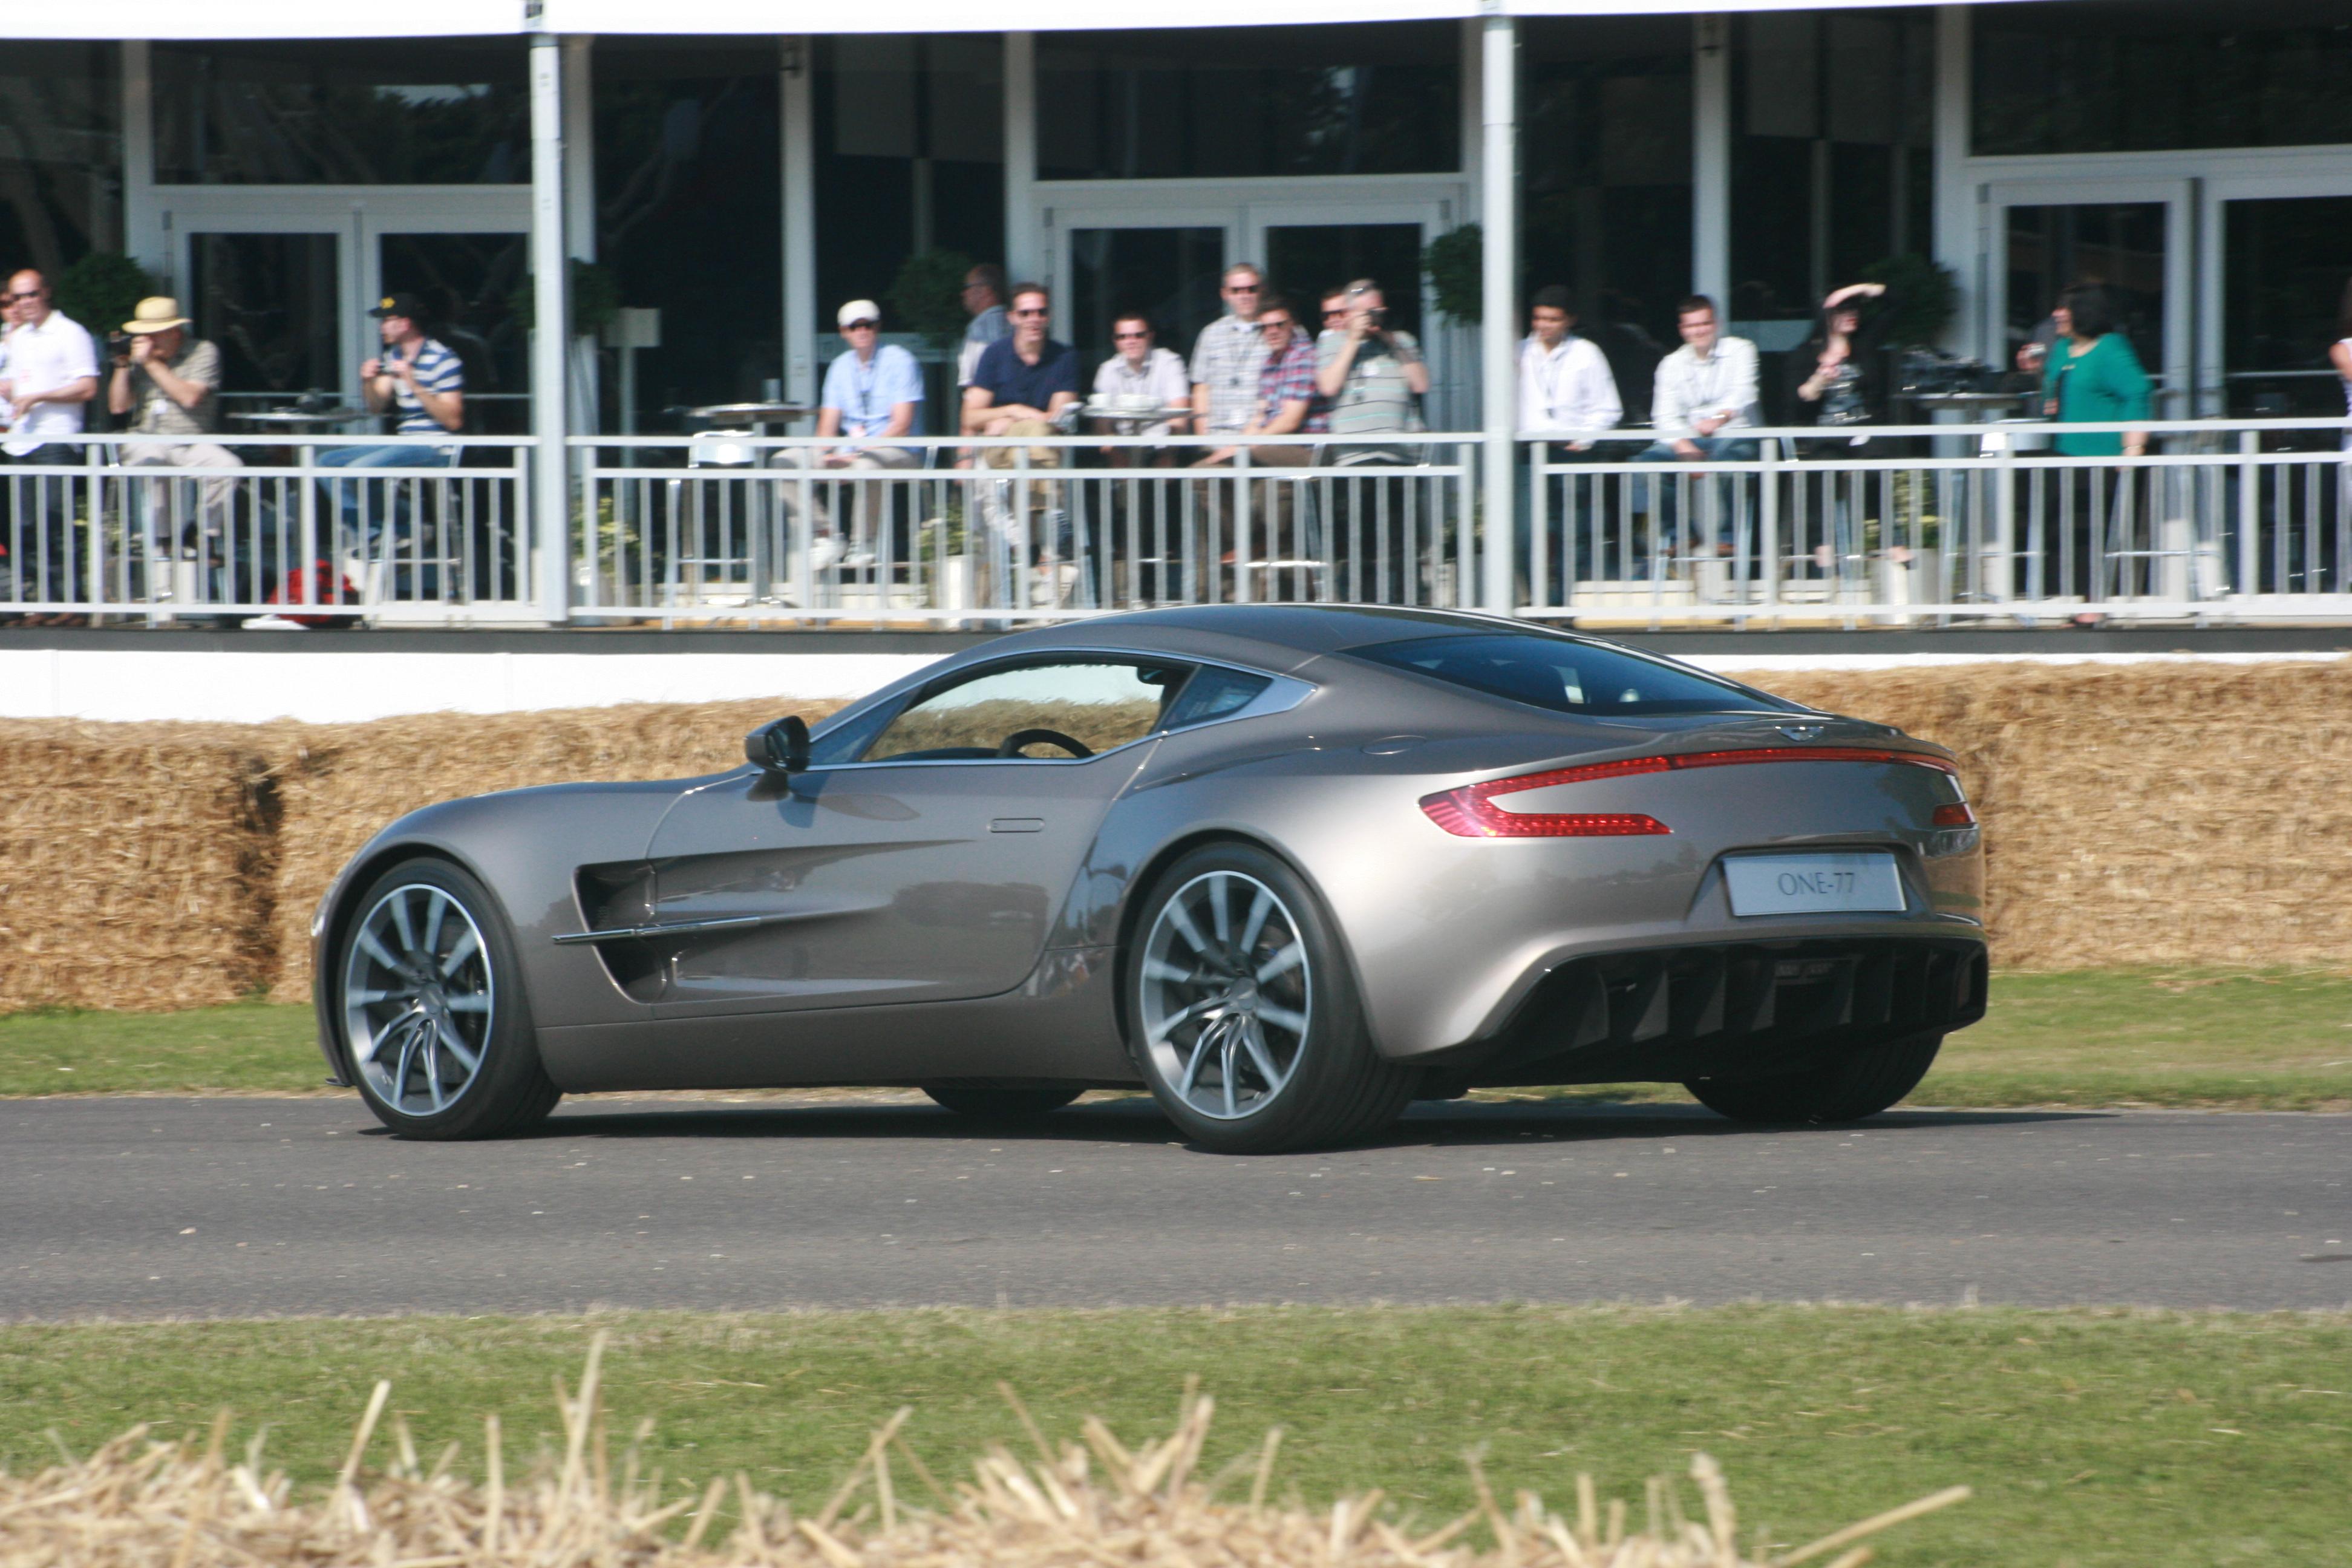 File Aston Martin One 77 Flickr Supermac1961 1 Jpg